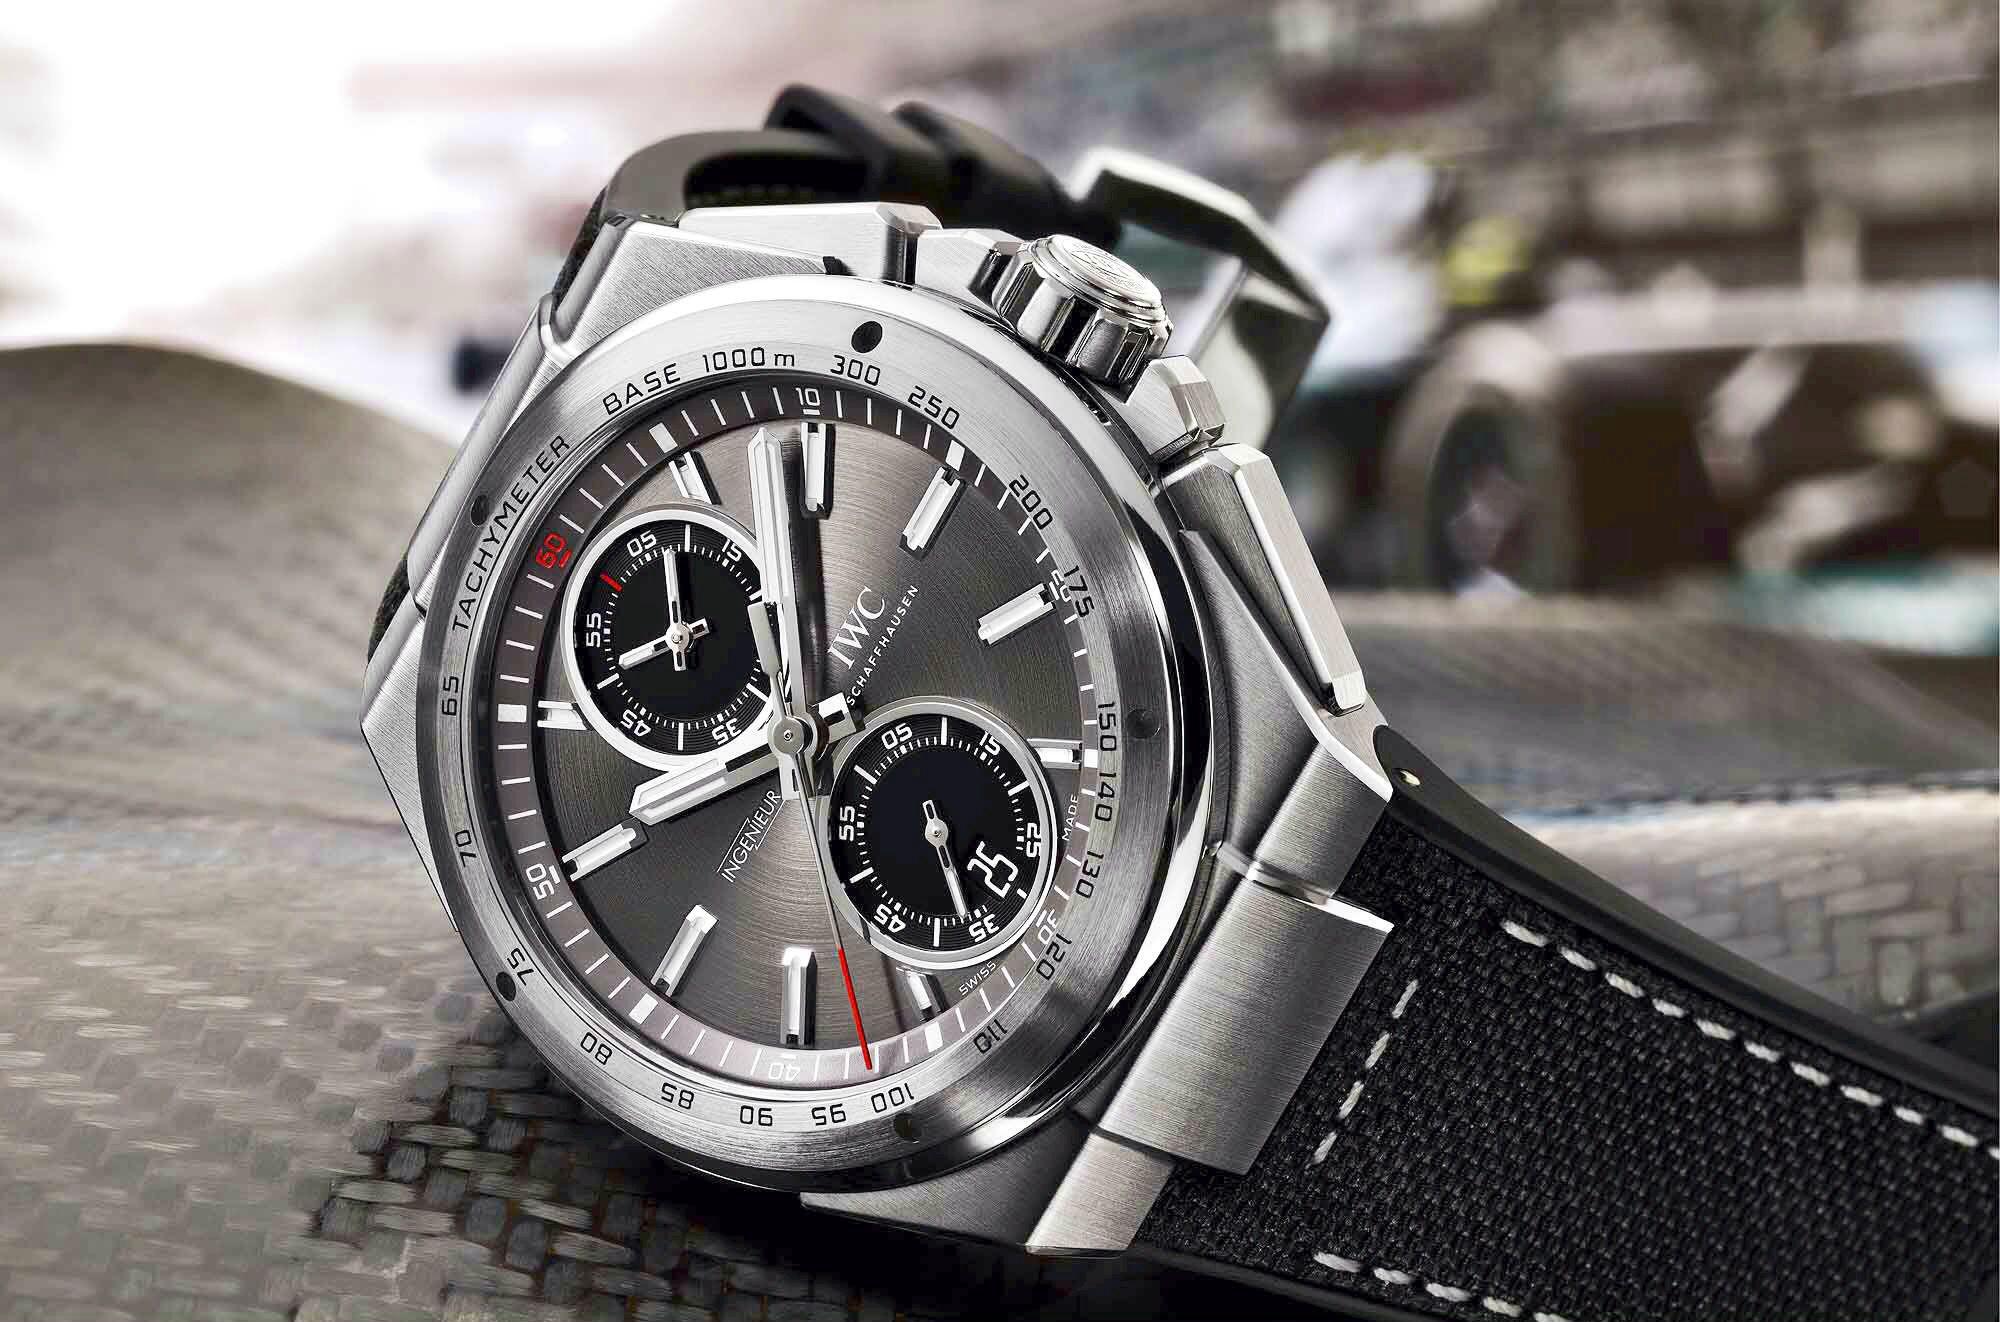 Мужской хронограф Mercedes-Benz Kompressor I Chronograph ... |Mercedes Benz Chrono Watches